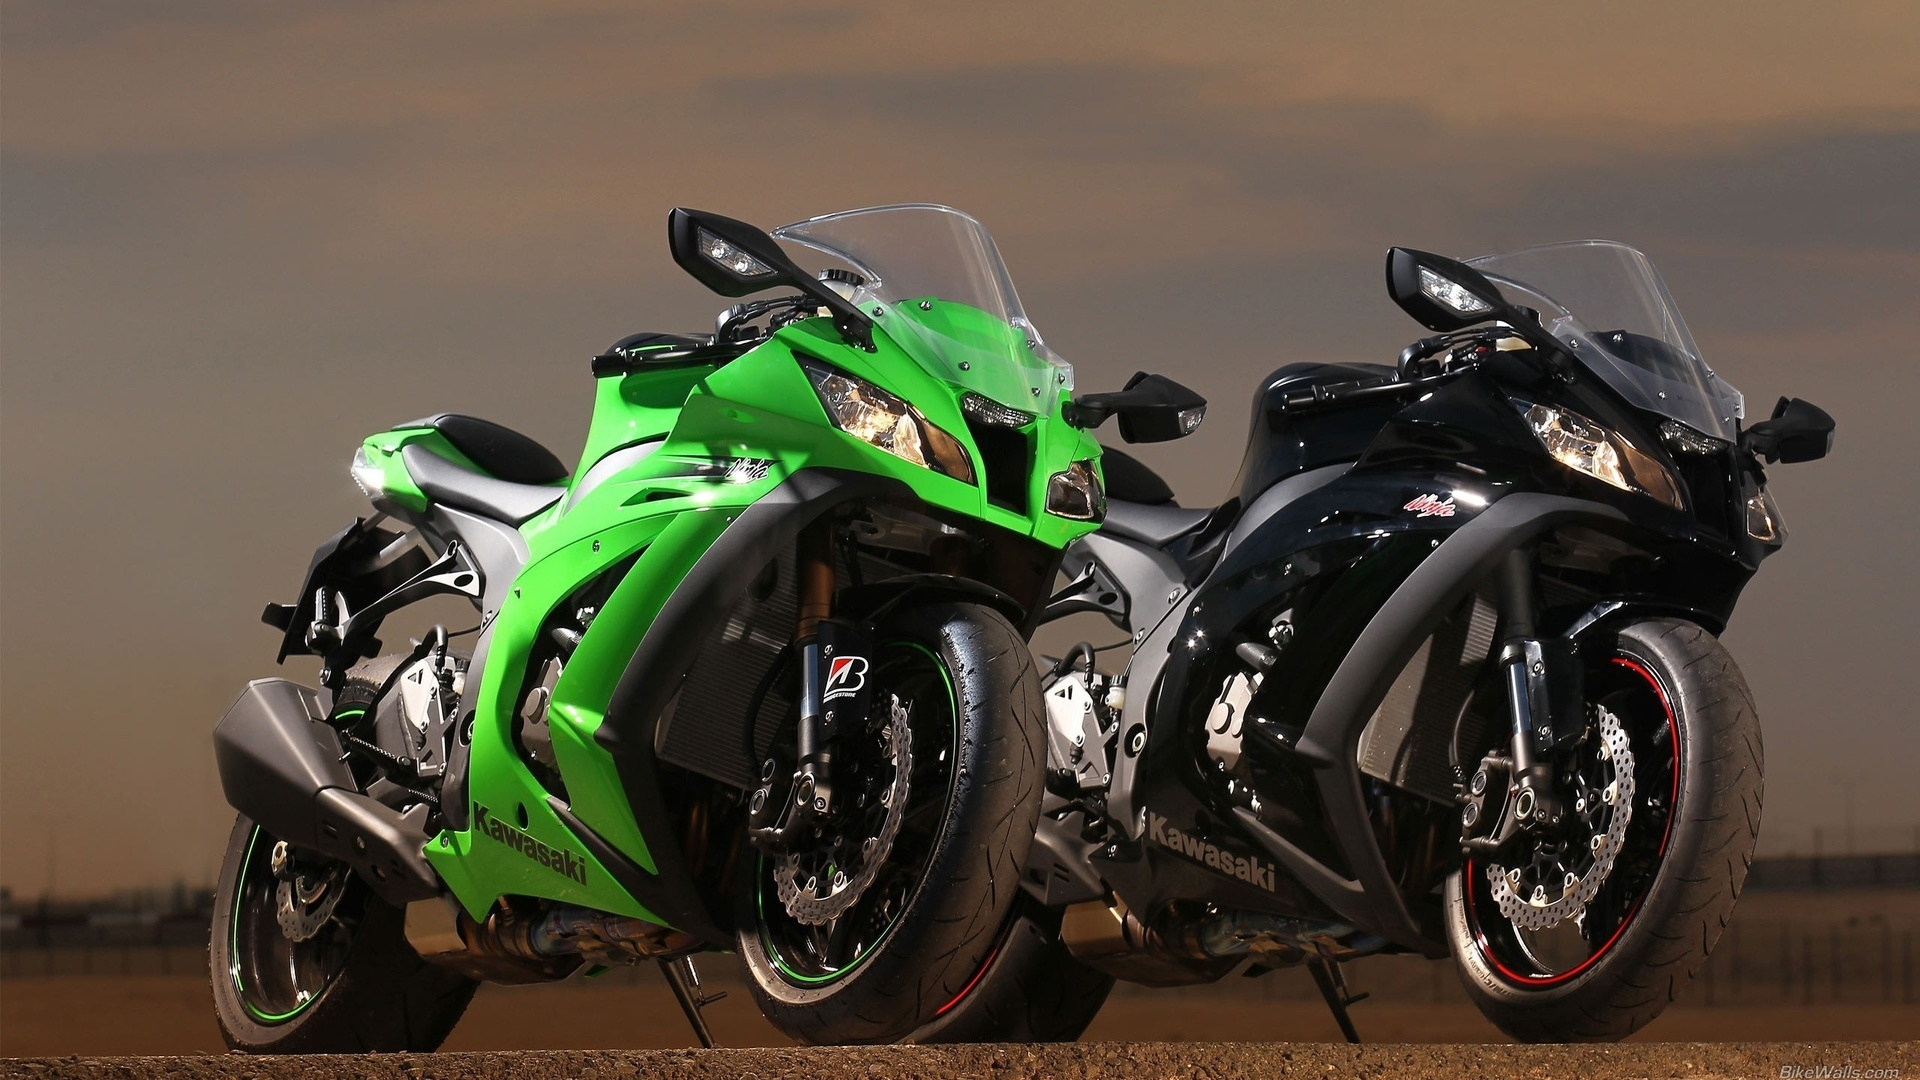 много картинок с мотоциклами карту